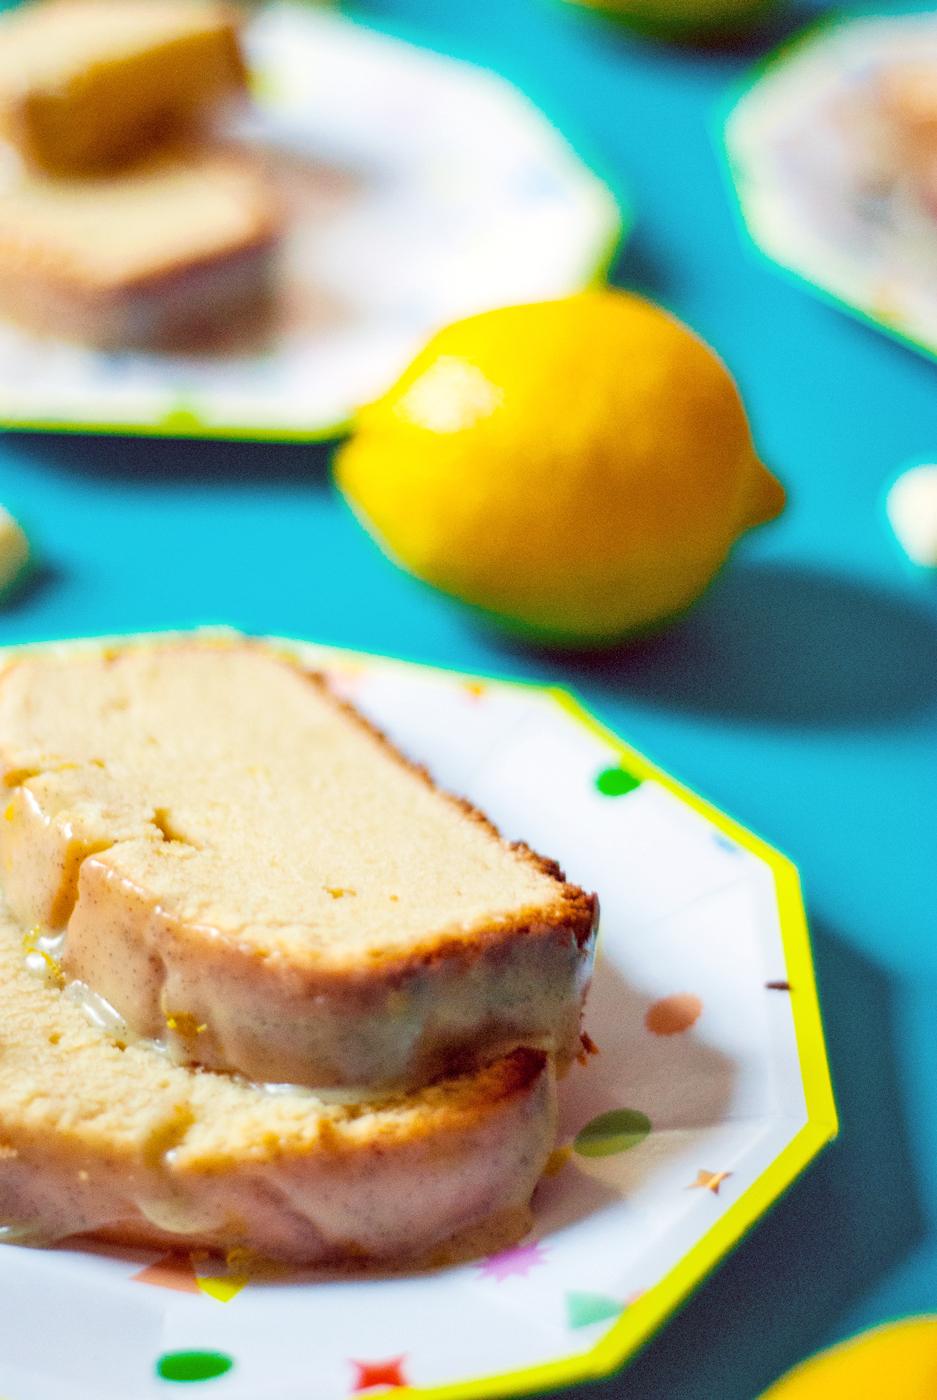 Lemon poundcake with white chocolate vanilla bean glaze | freckleandfair.com